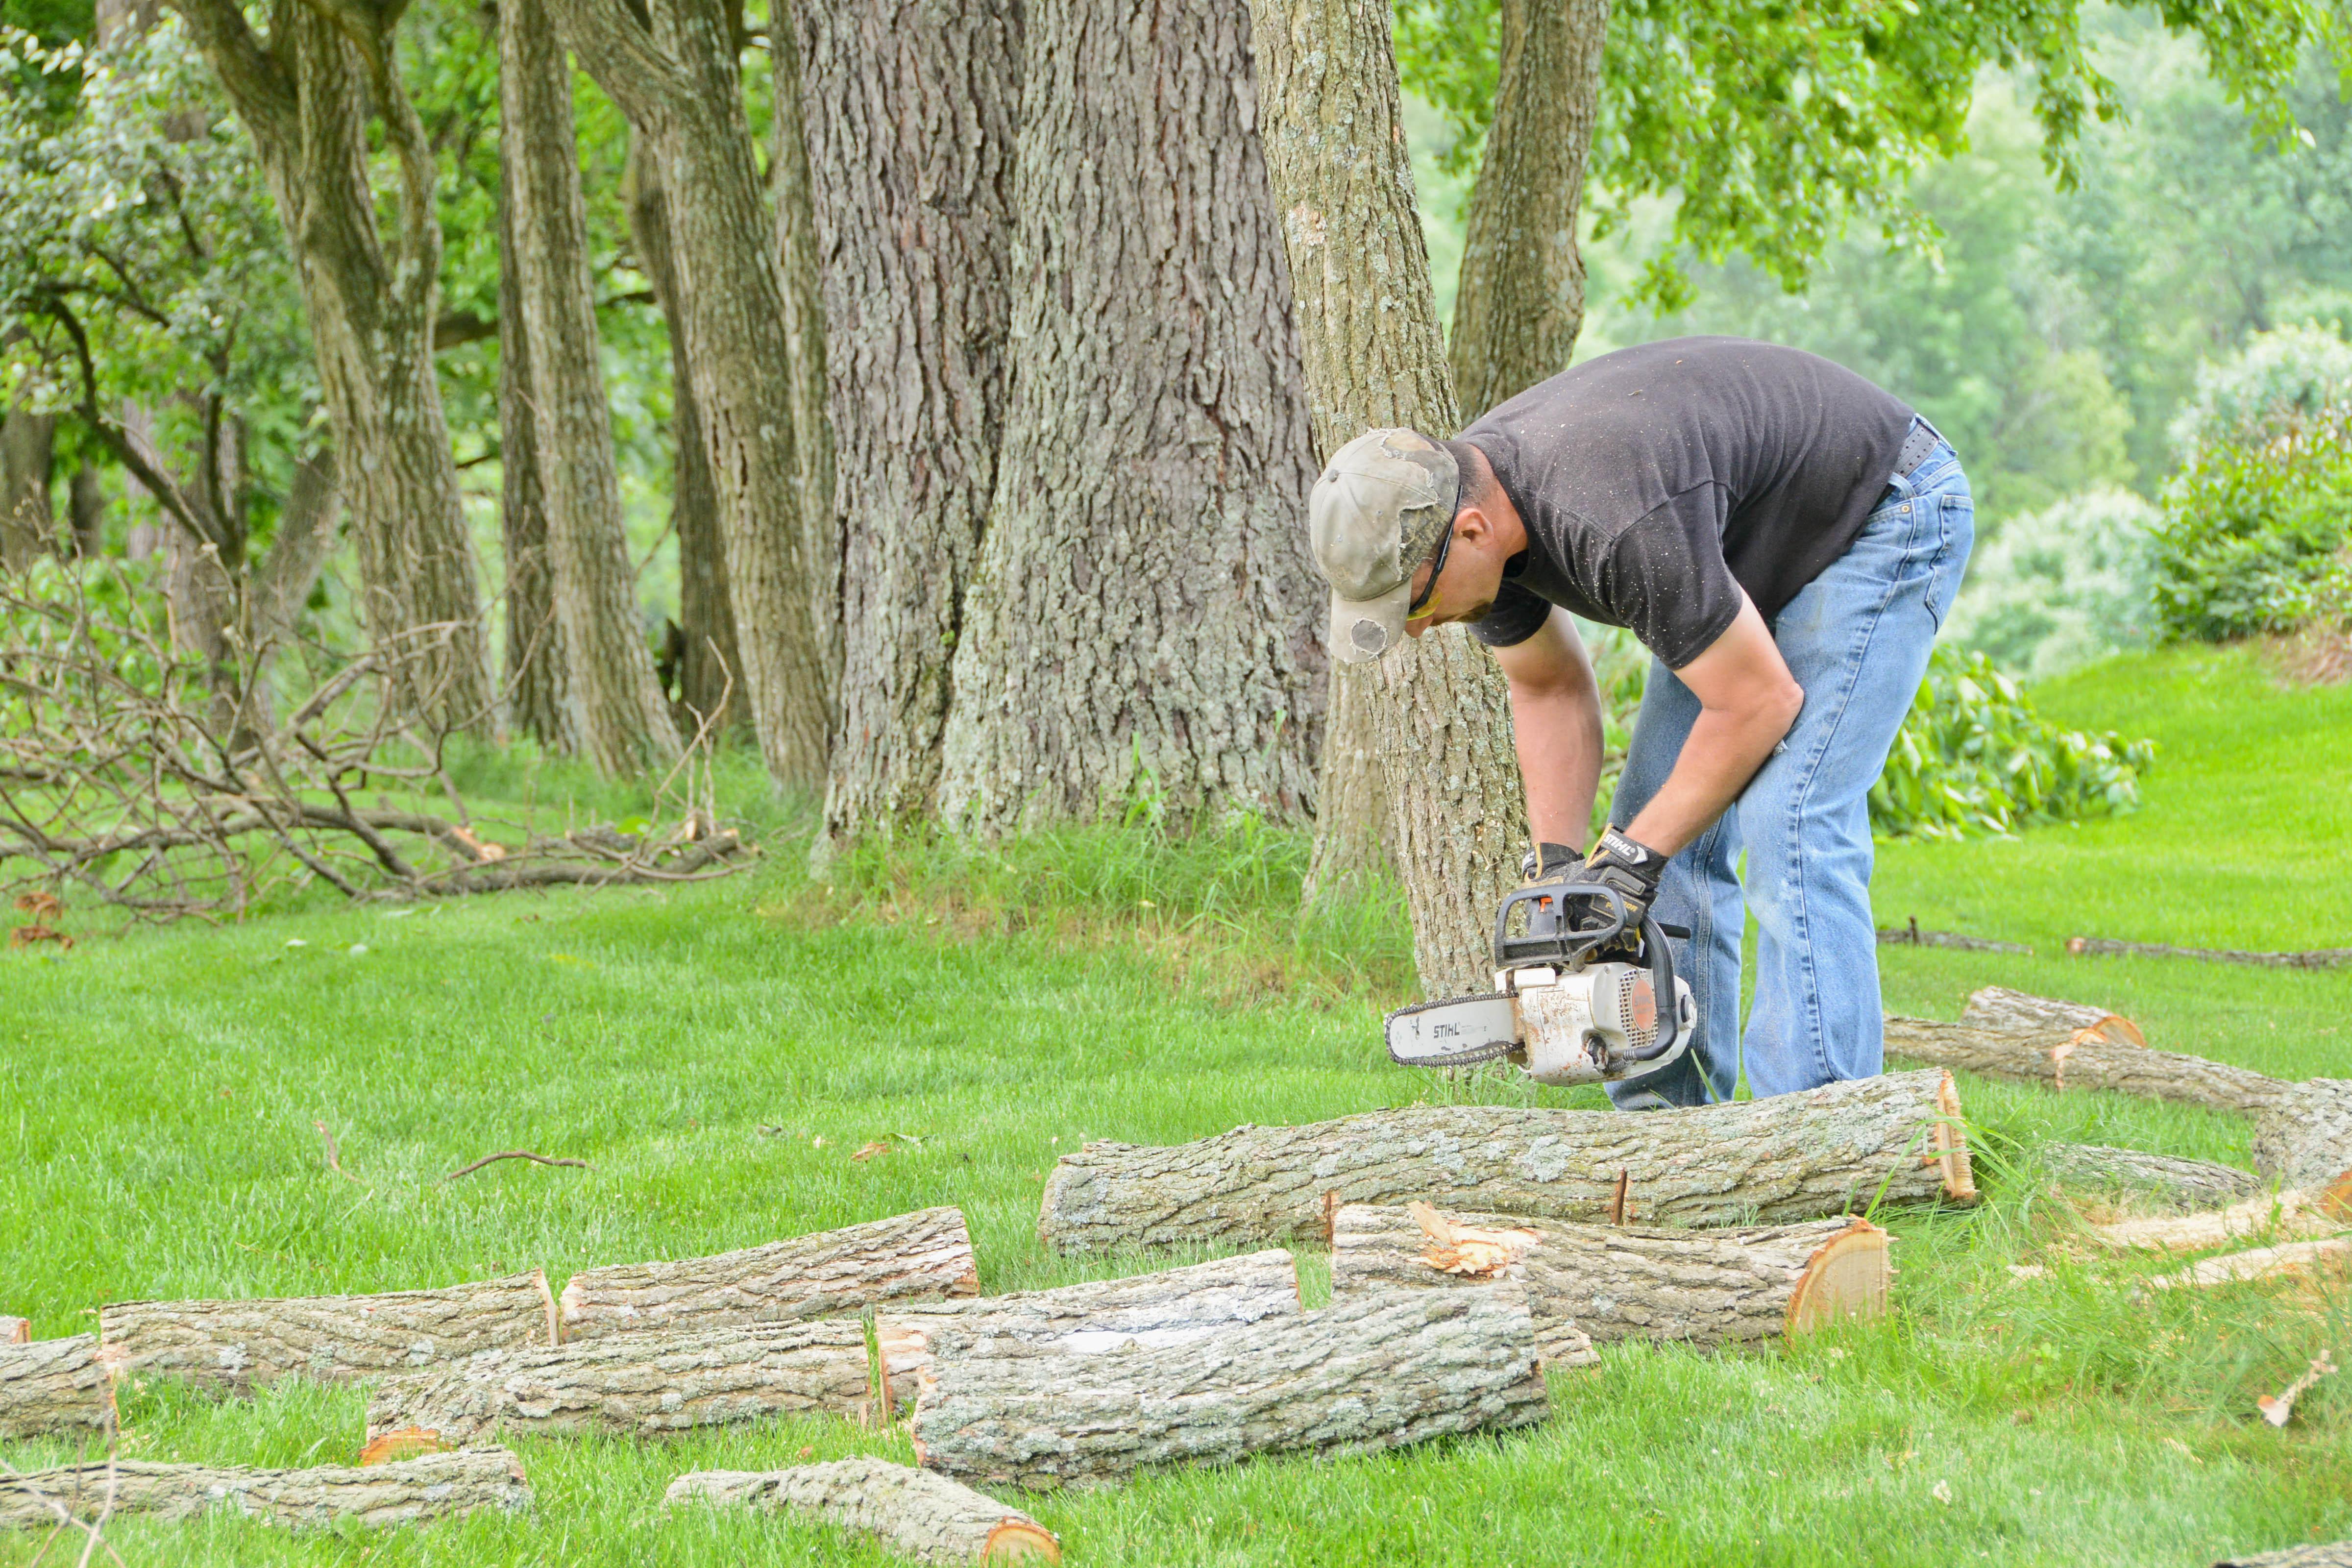 No Sweat Lawns & Trees, LLC image 1